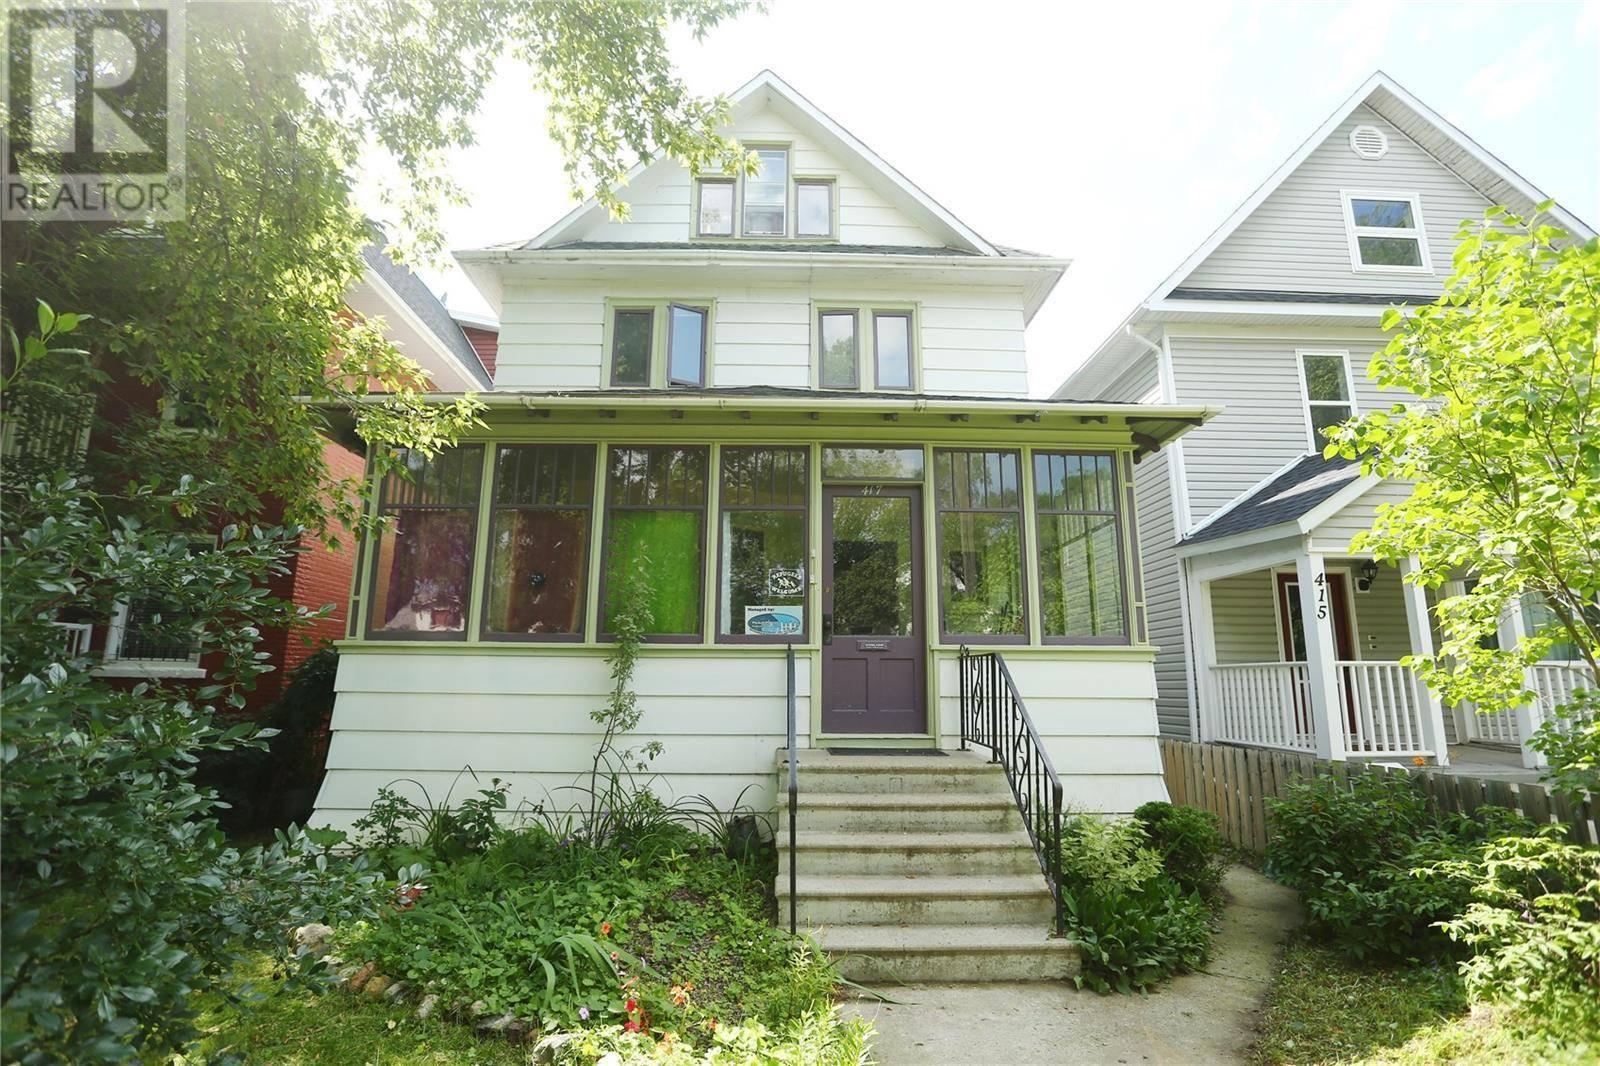 House for sale at 417 H Ave S Saskatoon Saskatchewan - MLS: SK788505